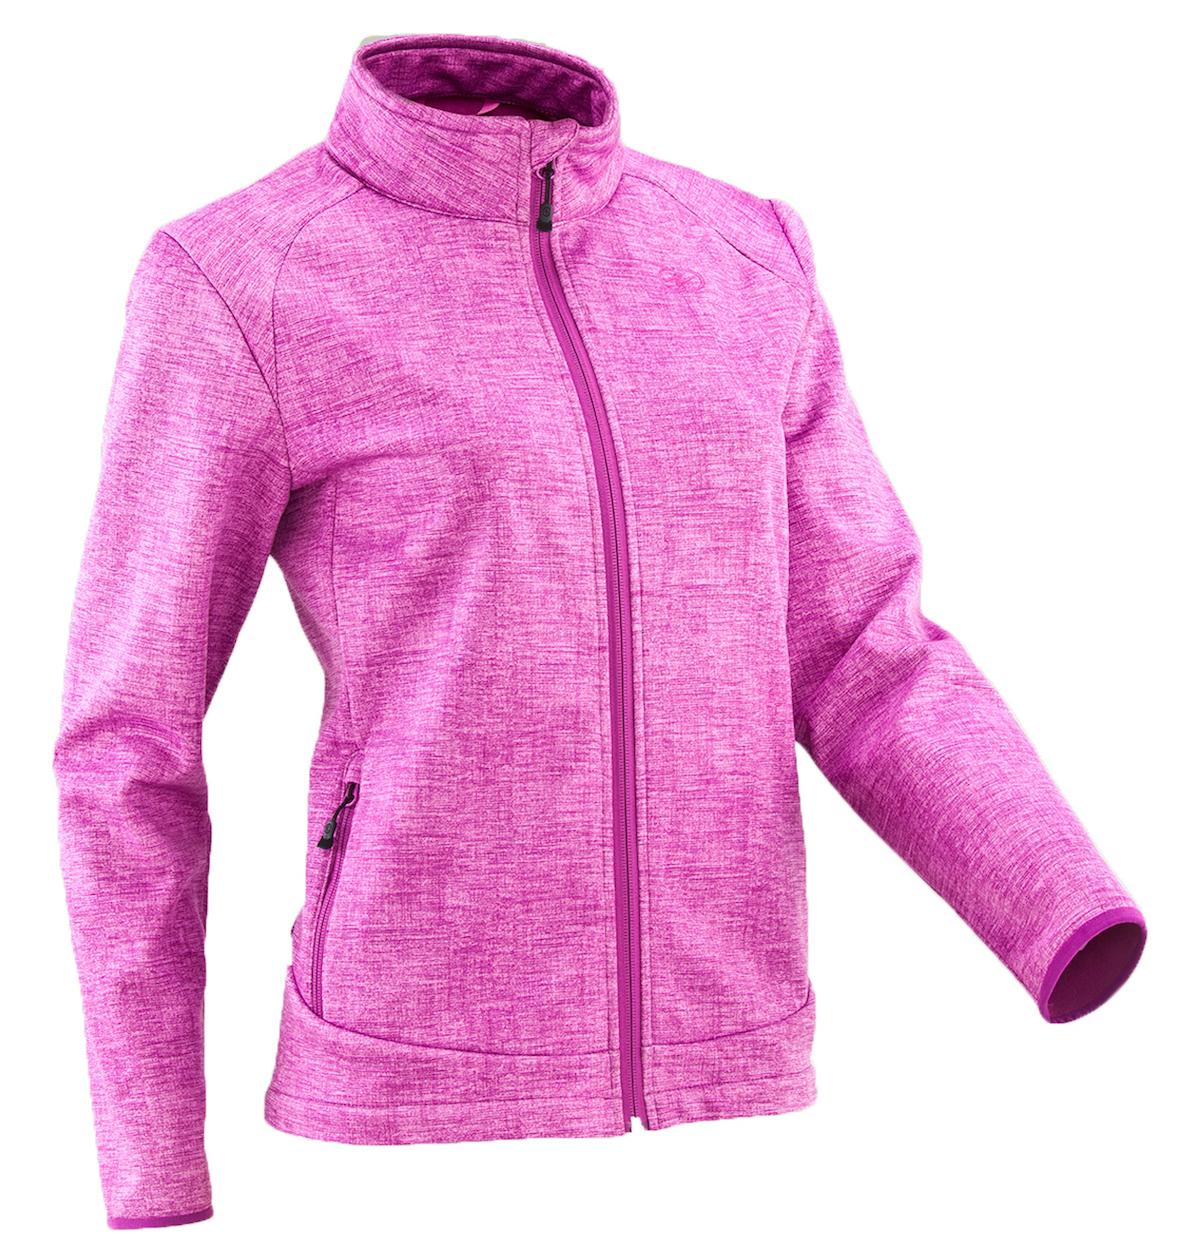 Damart Sport - Soft Shell imperméable et respirante - Softshell jacket  - Women's